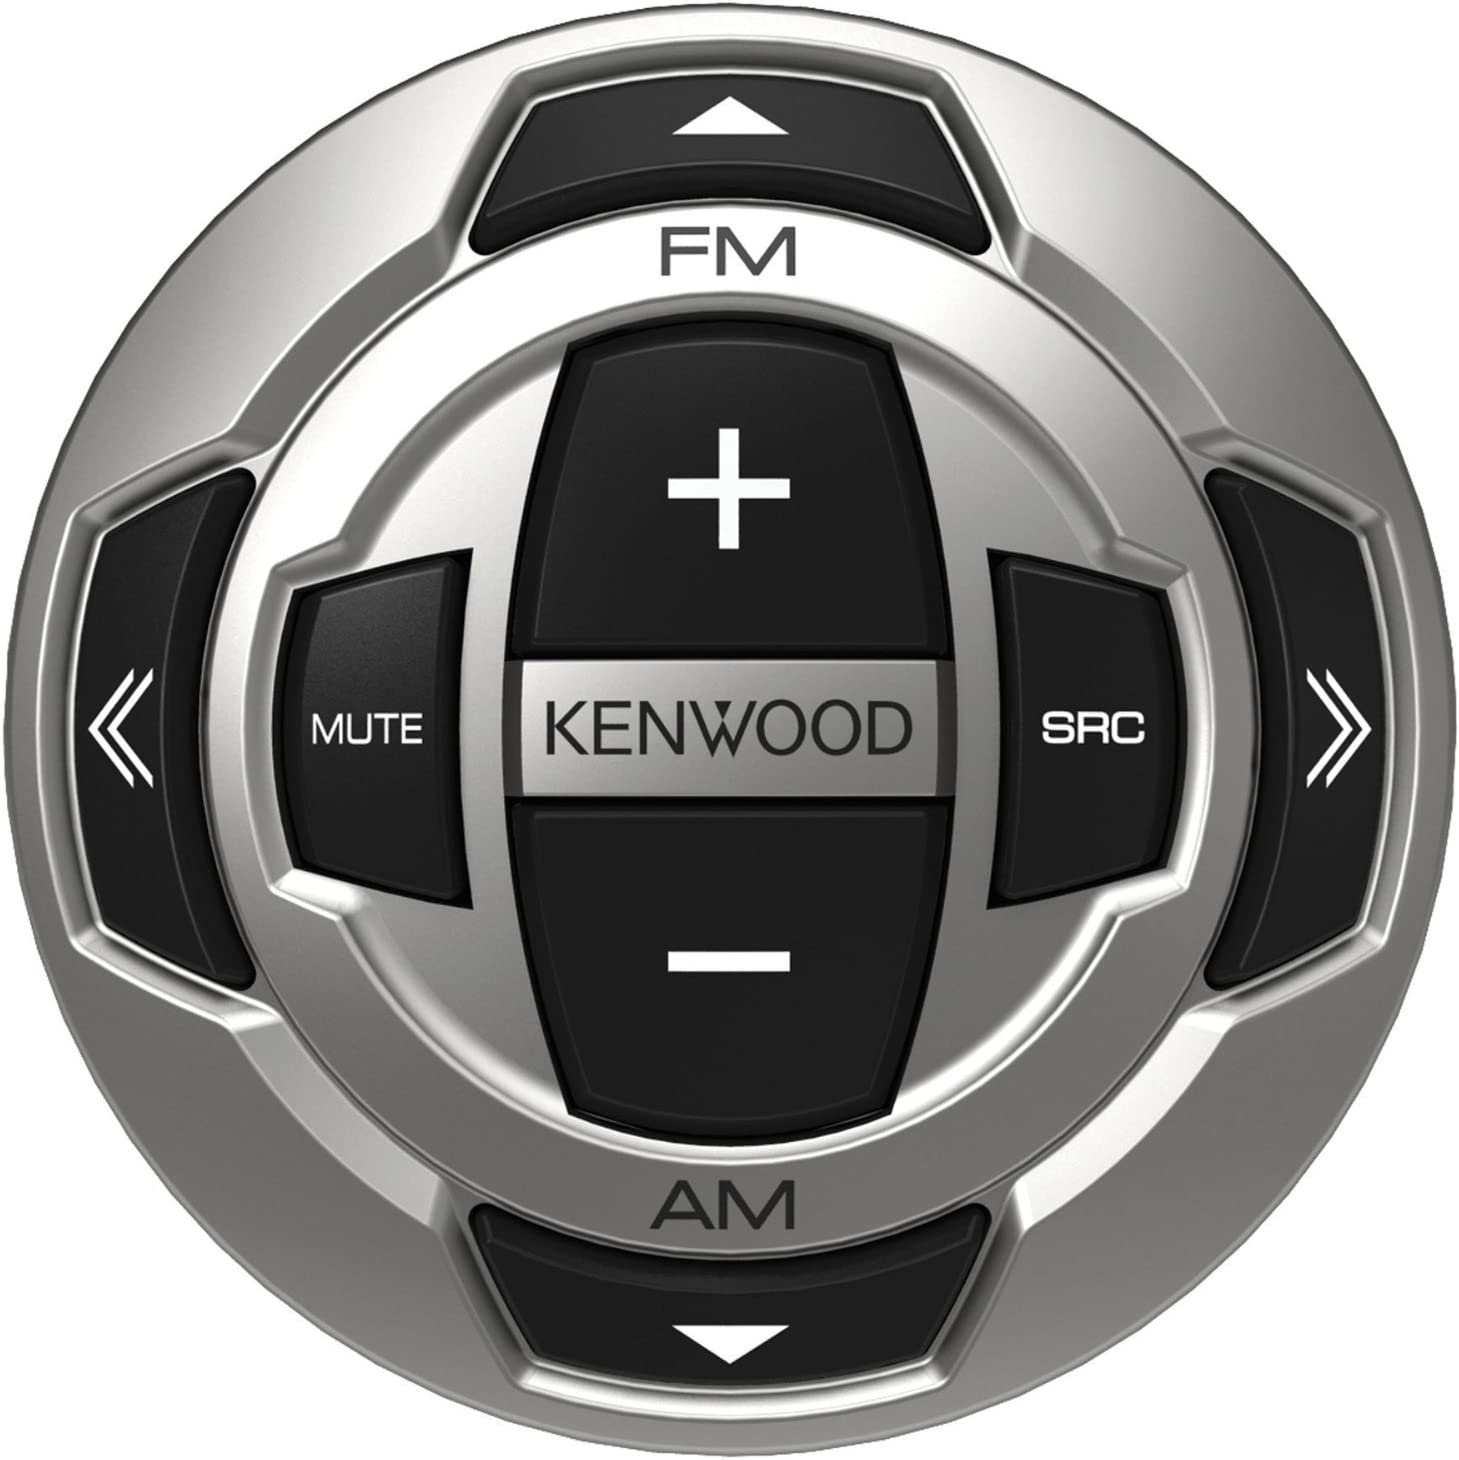 KENWOOD KCA-RC35MR REMOTE - FOR KMR700U/550U/350U